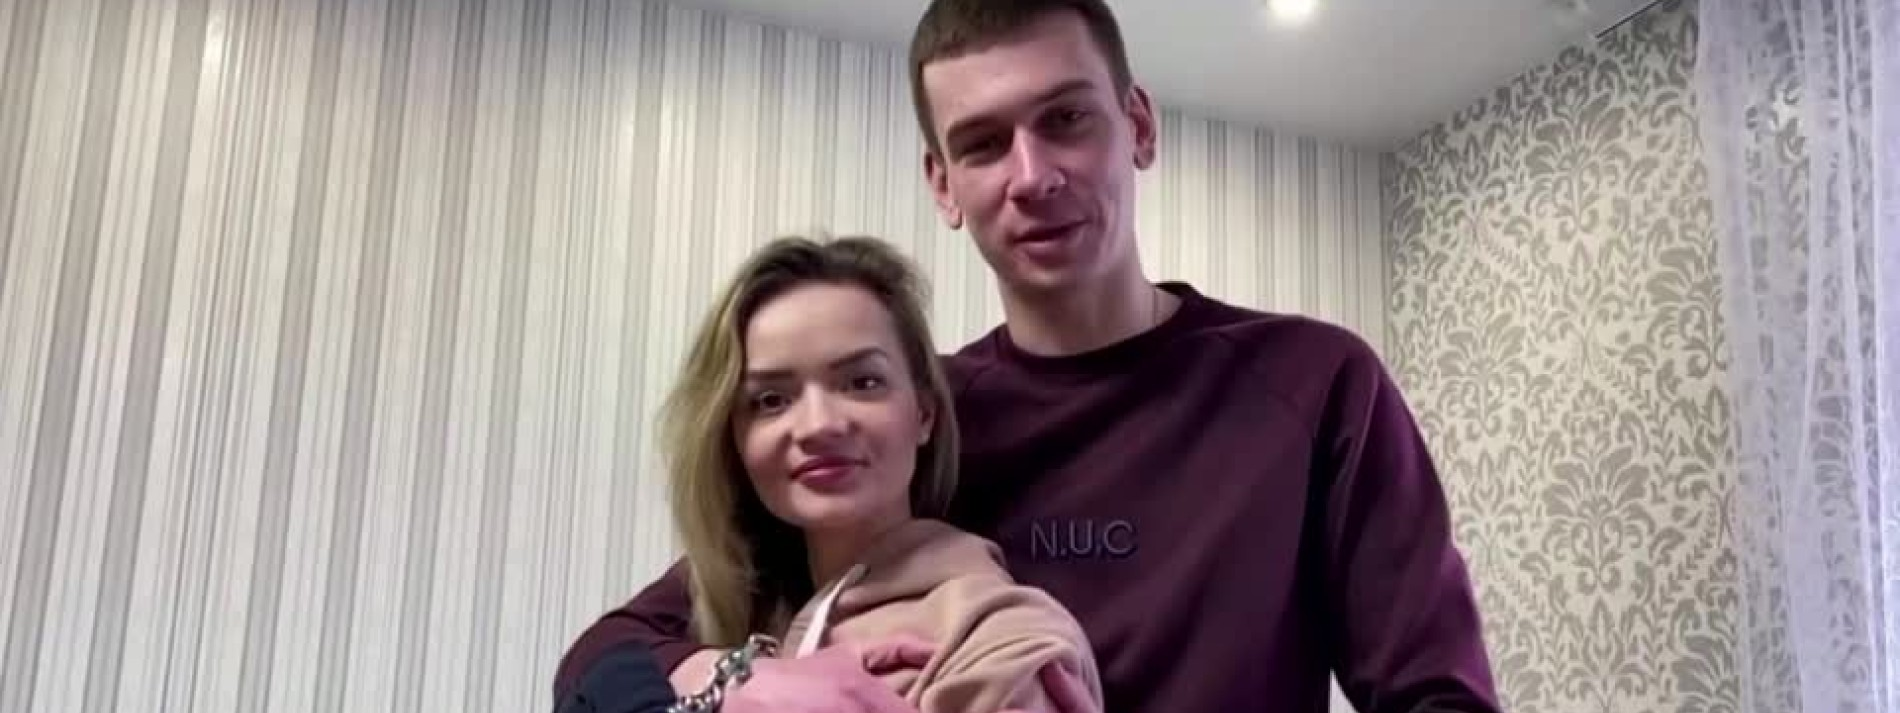 Ukrainisches Paar will mit Handschellen Beziehung retten